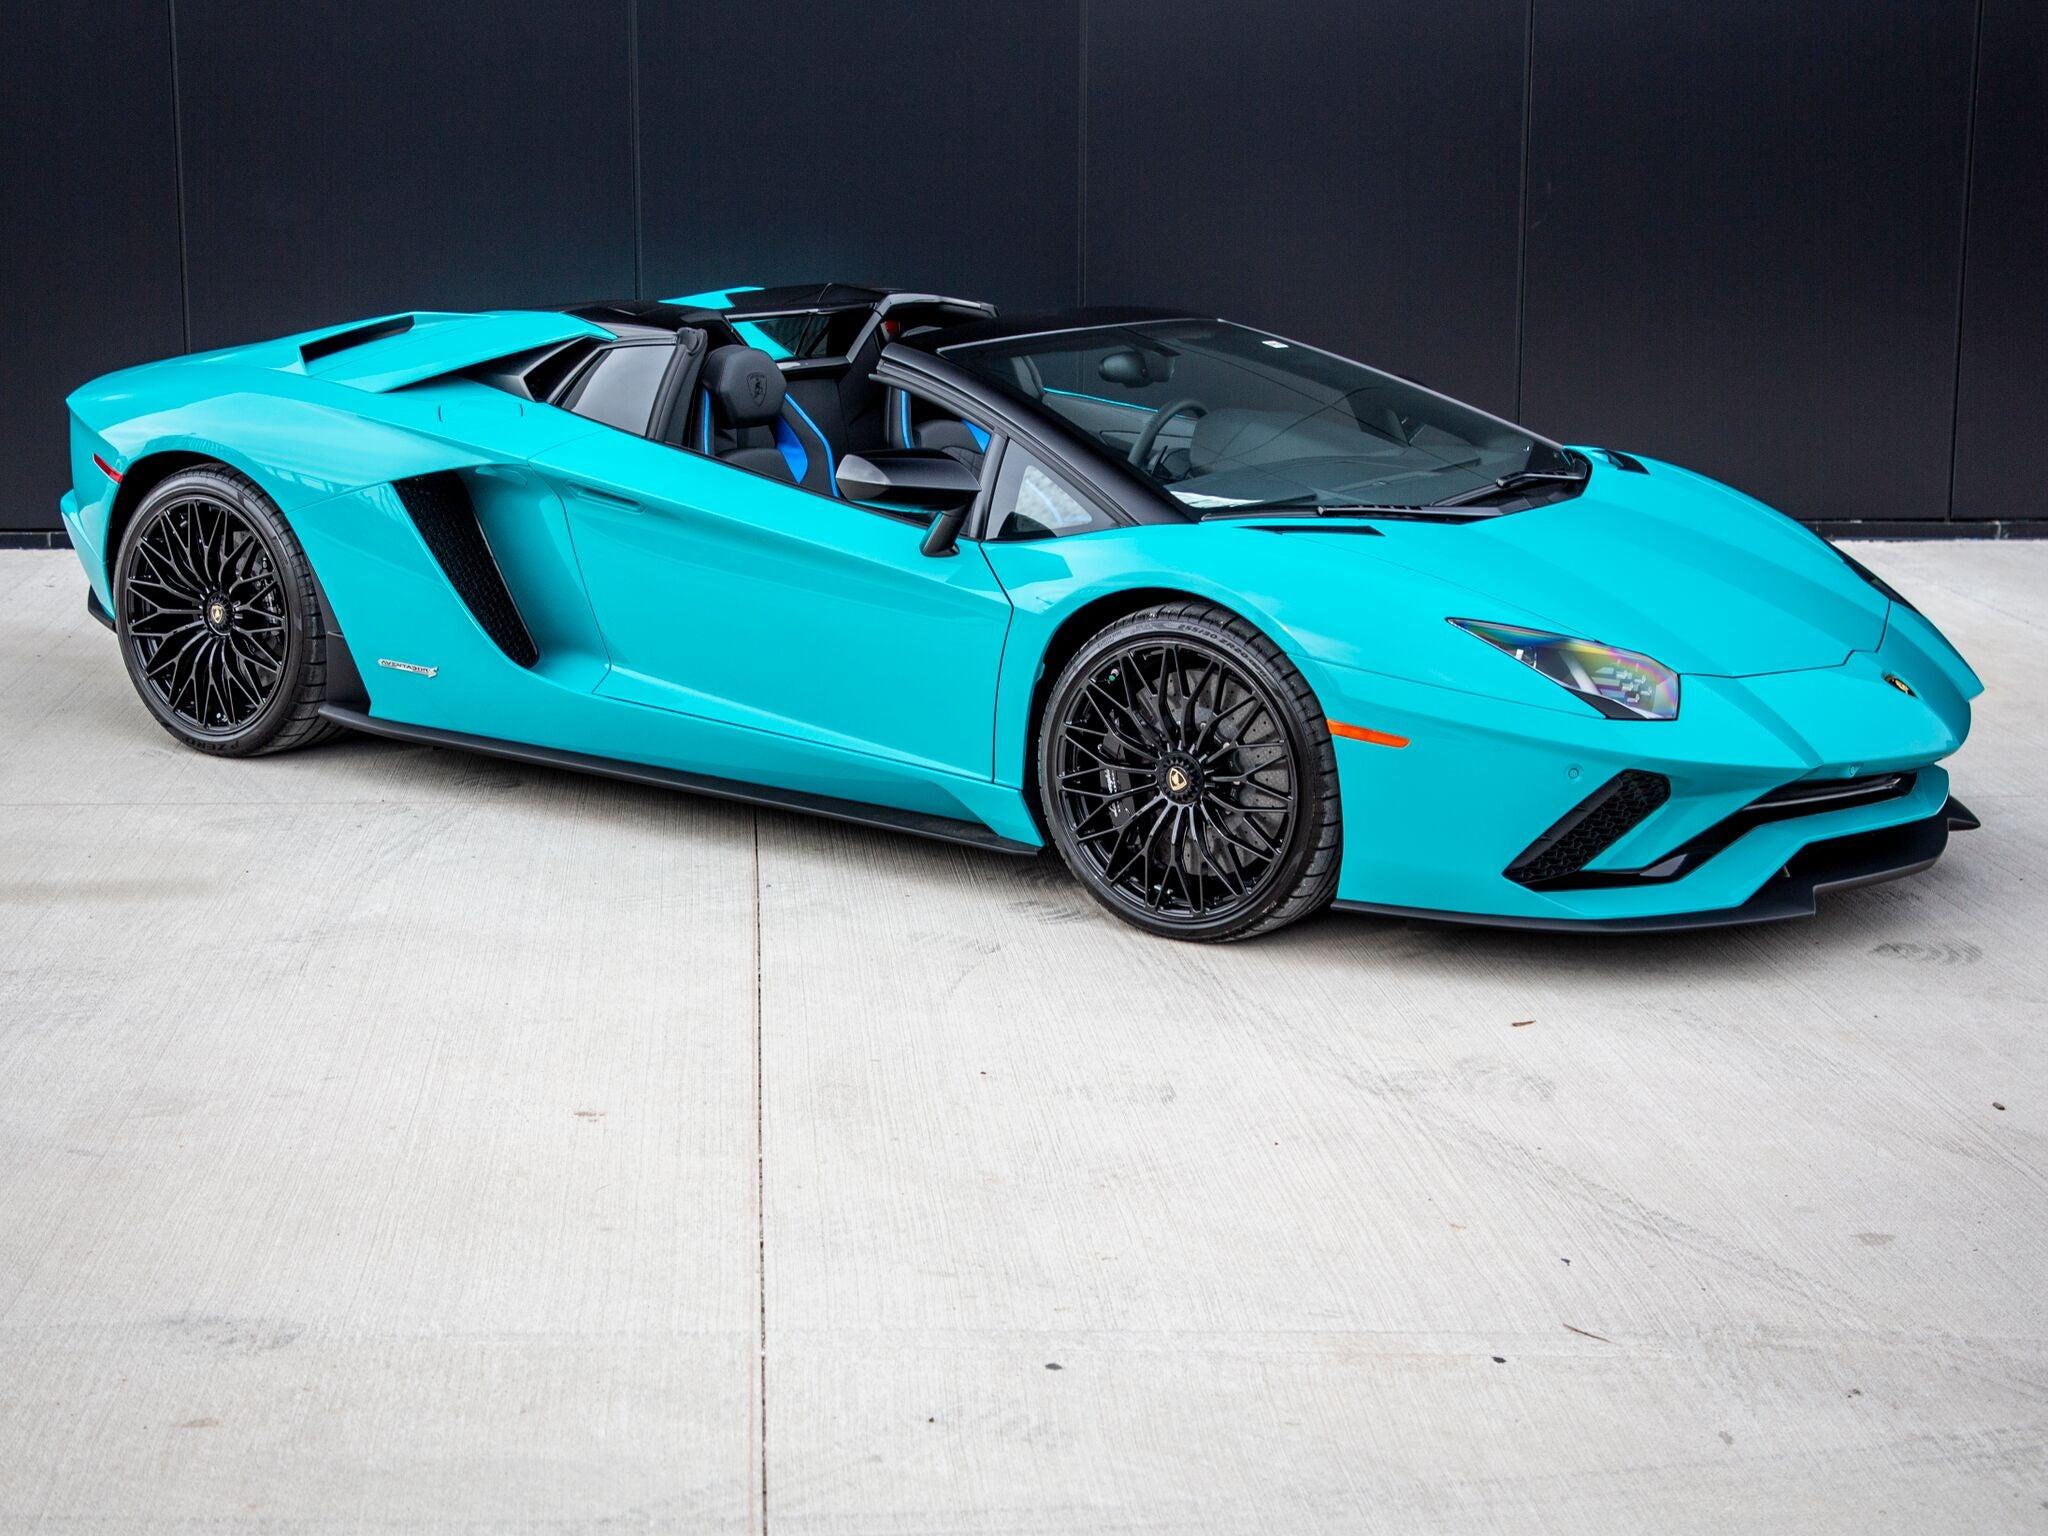 Lamborghini New Car Specials Rancho Mirage Lamborghini Dealer In